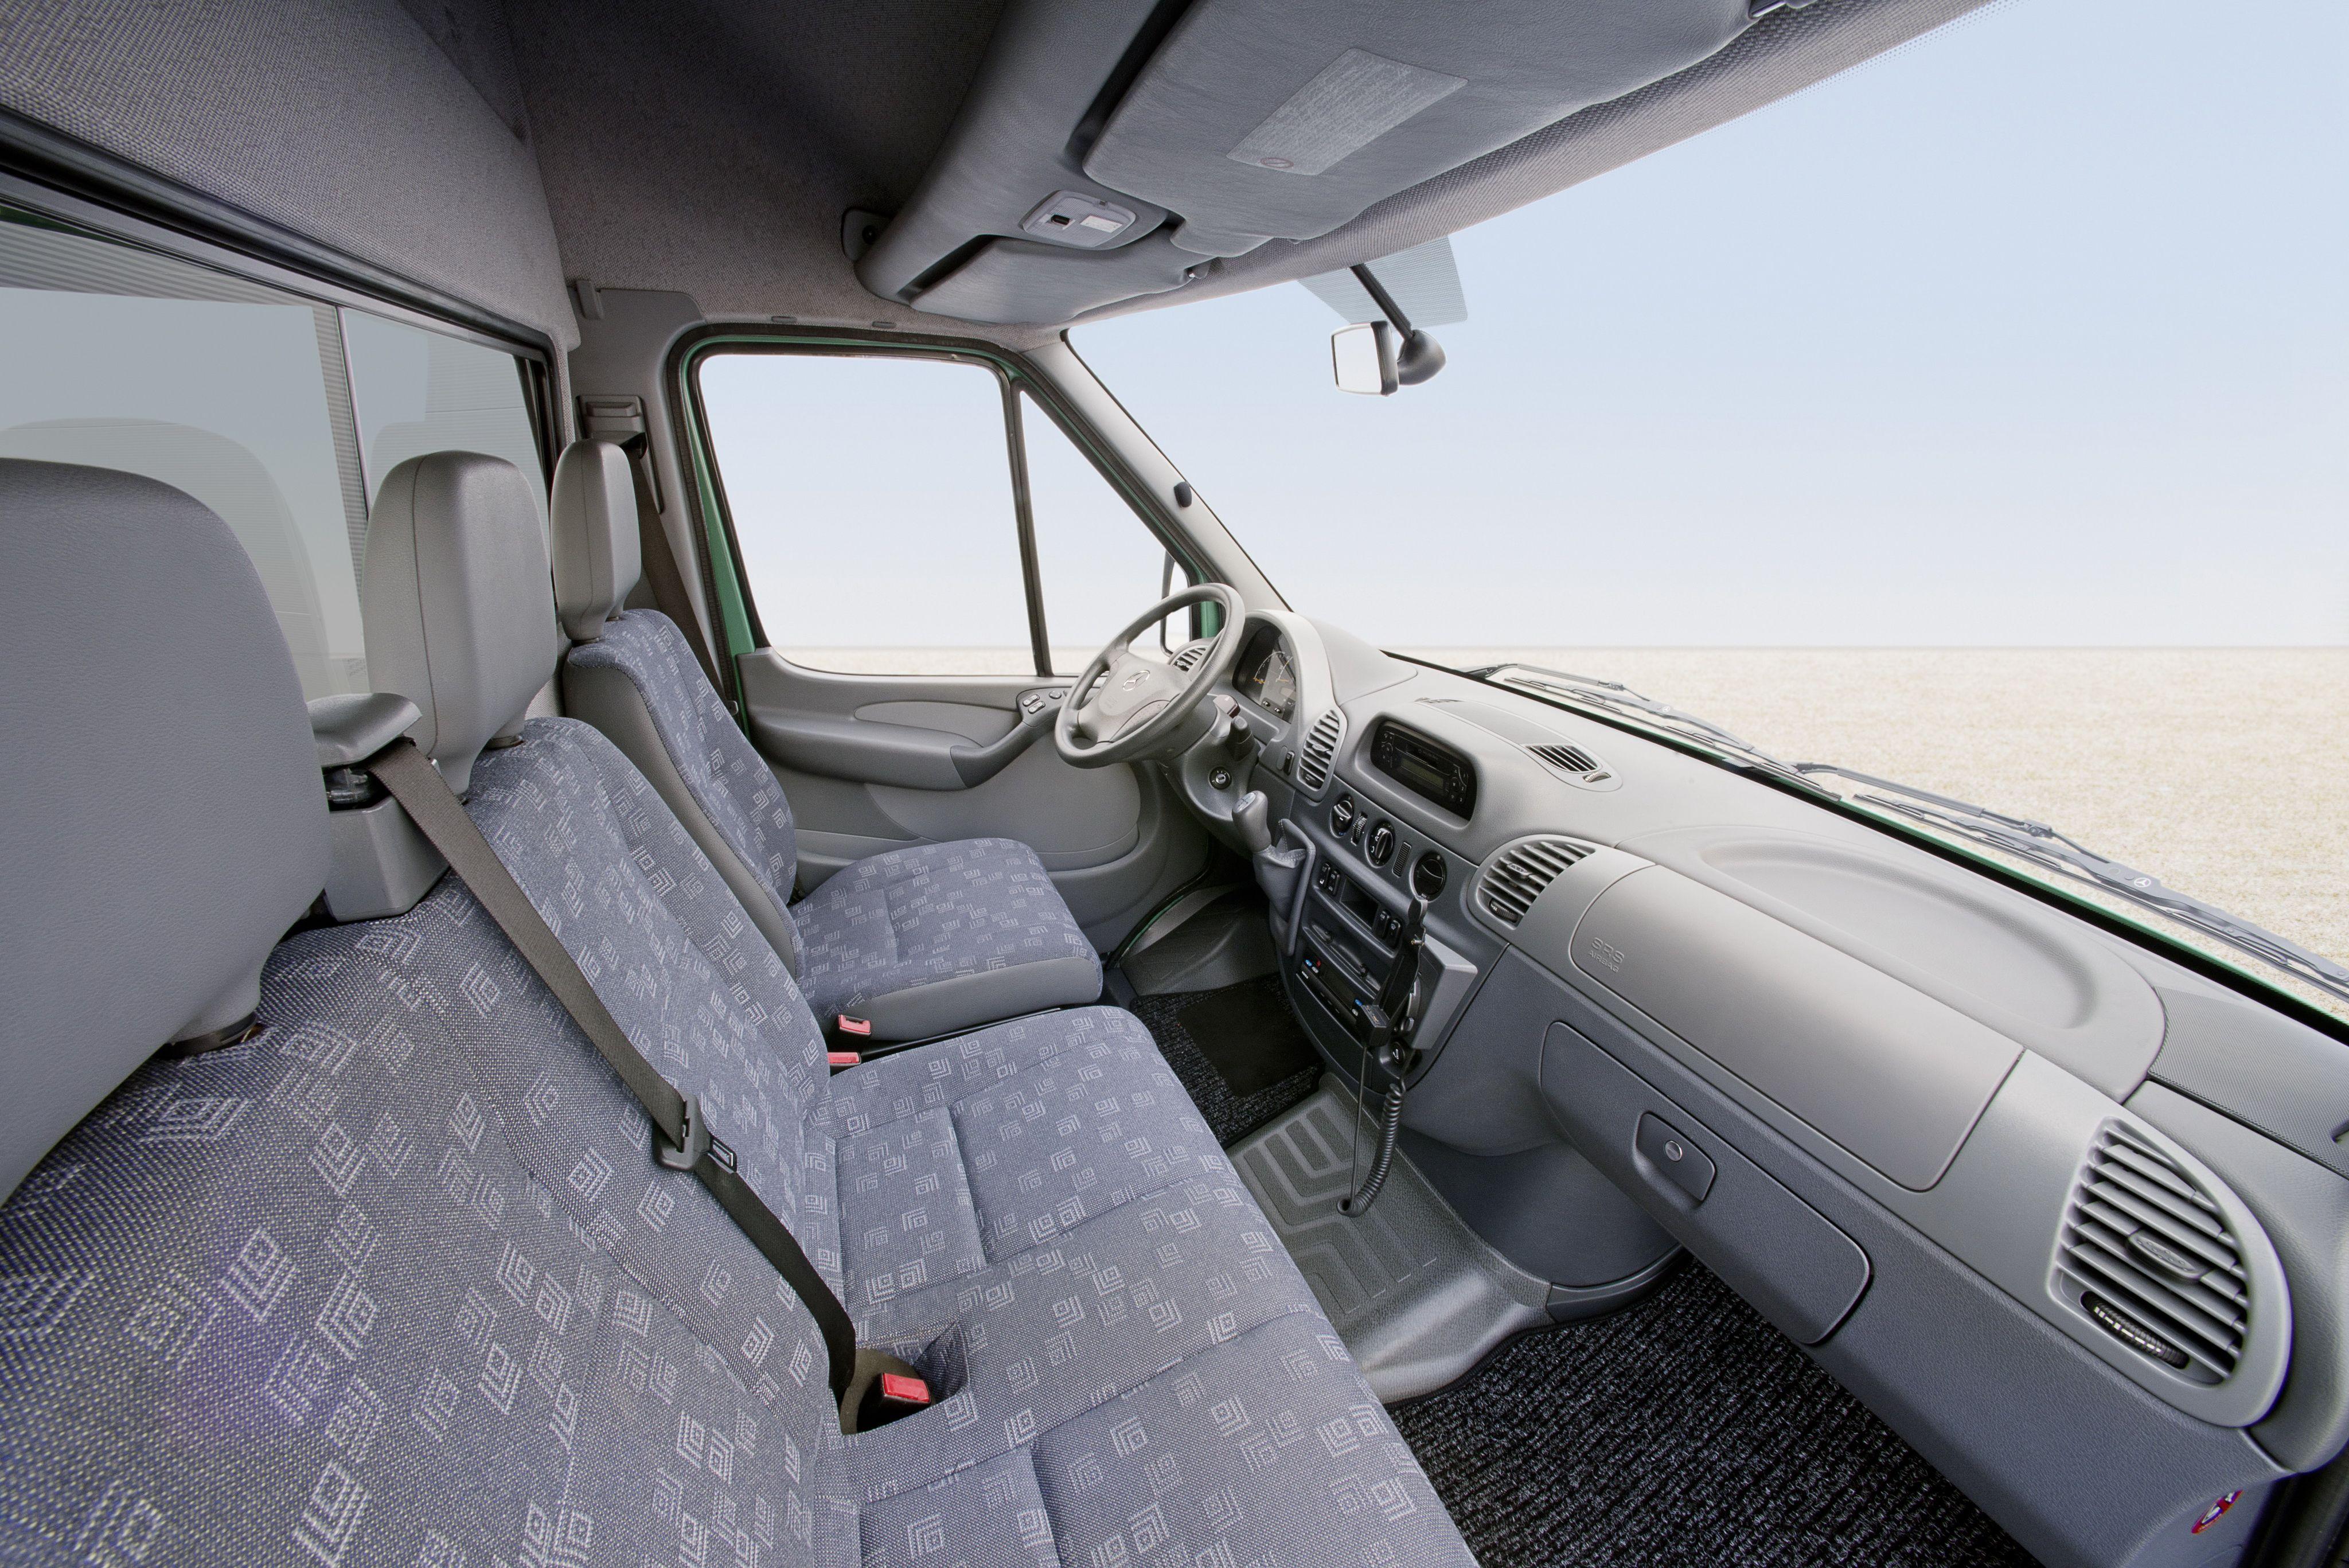 mercedes benz sprinter 313 cdi kastenwagen 39 2002. Black Bedroom Furniture Sets. Home Design Ideas